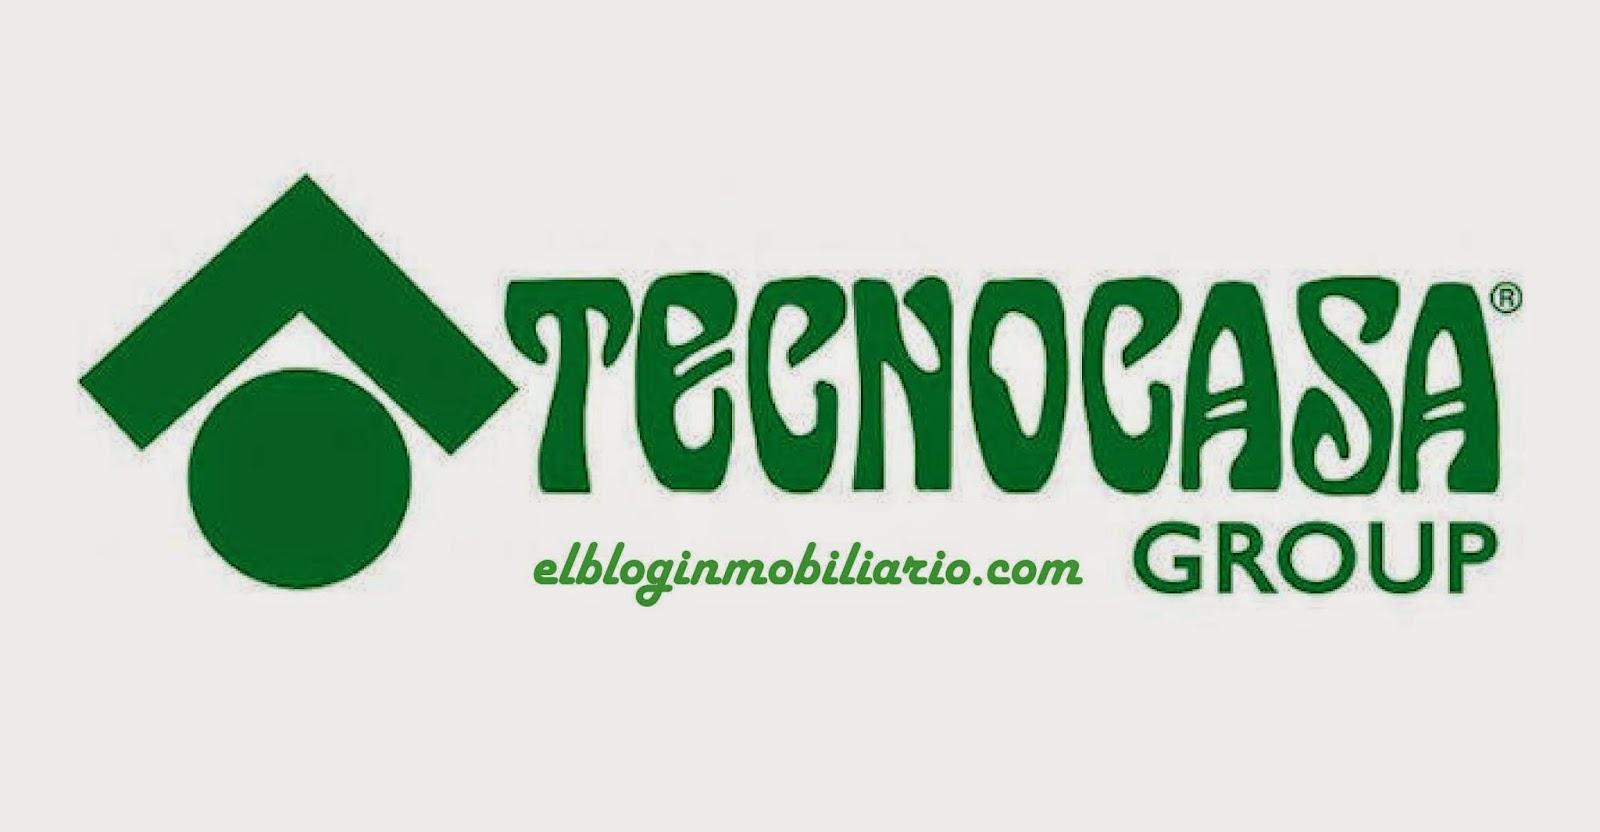 Tecnocasa elbloginmobiliario.com